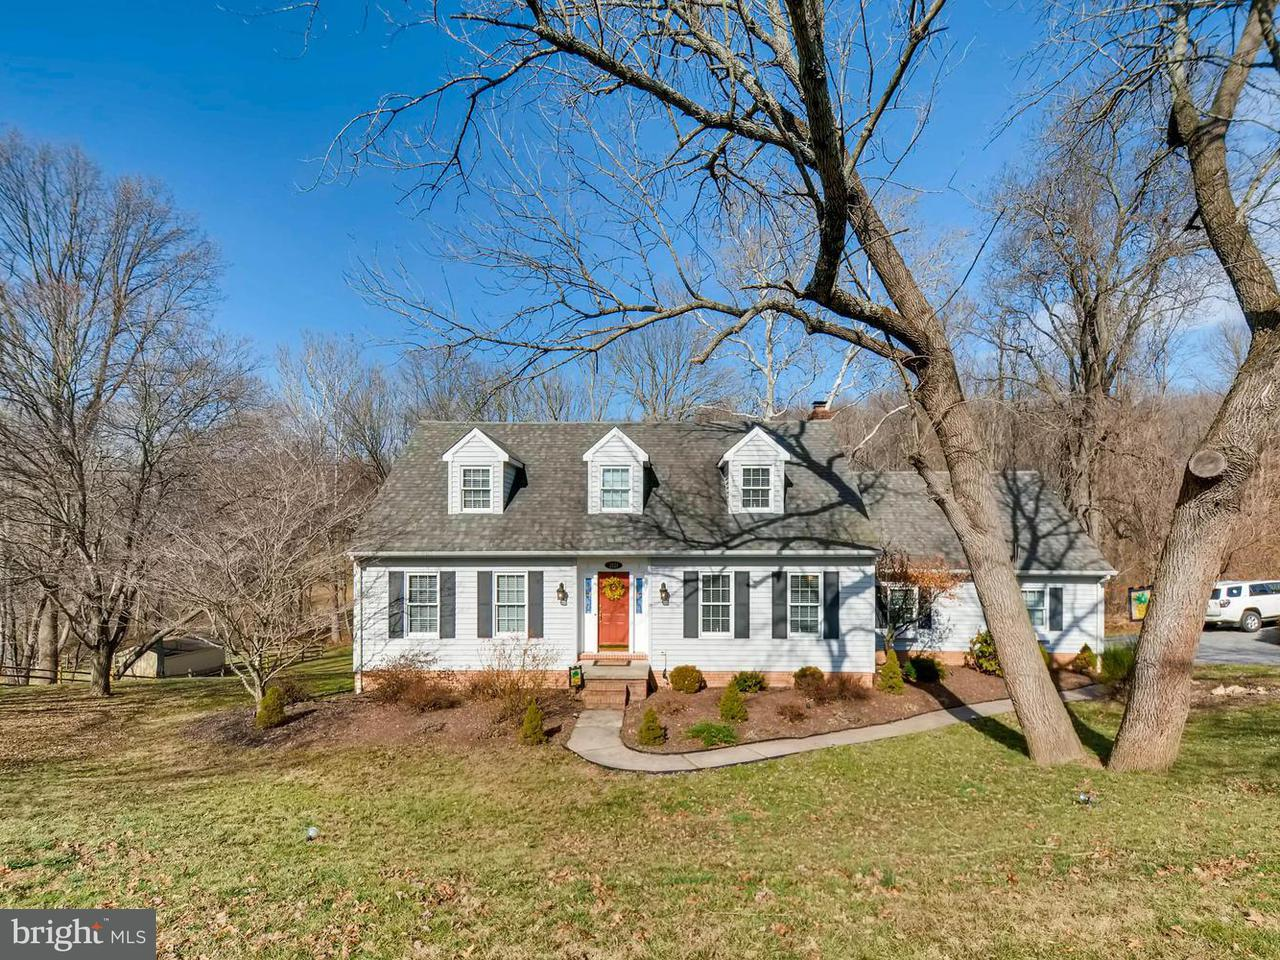 Single Family Home for Sale at 2121 Hampton Court 2121 Hampton Court Fallston, Maryland 21047 United States